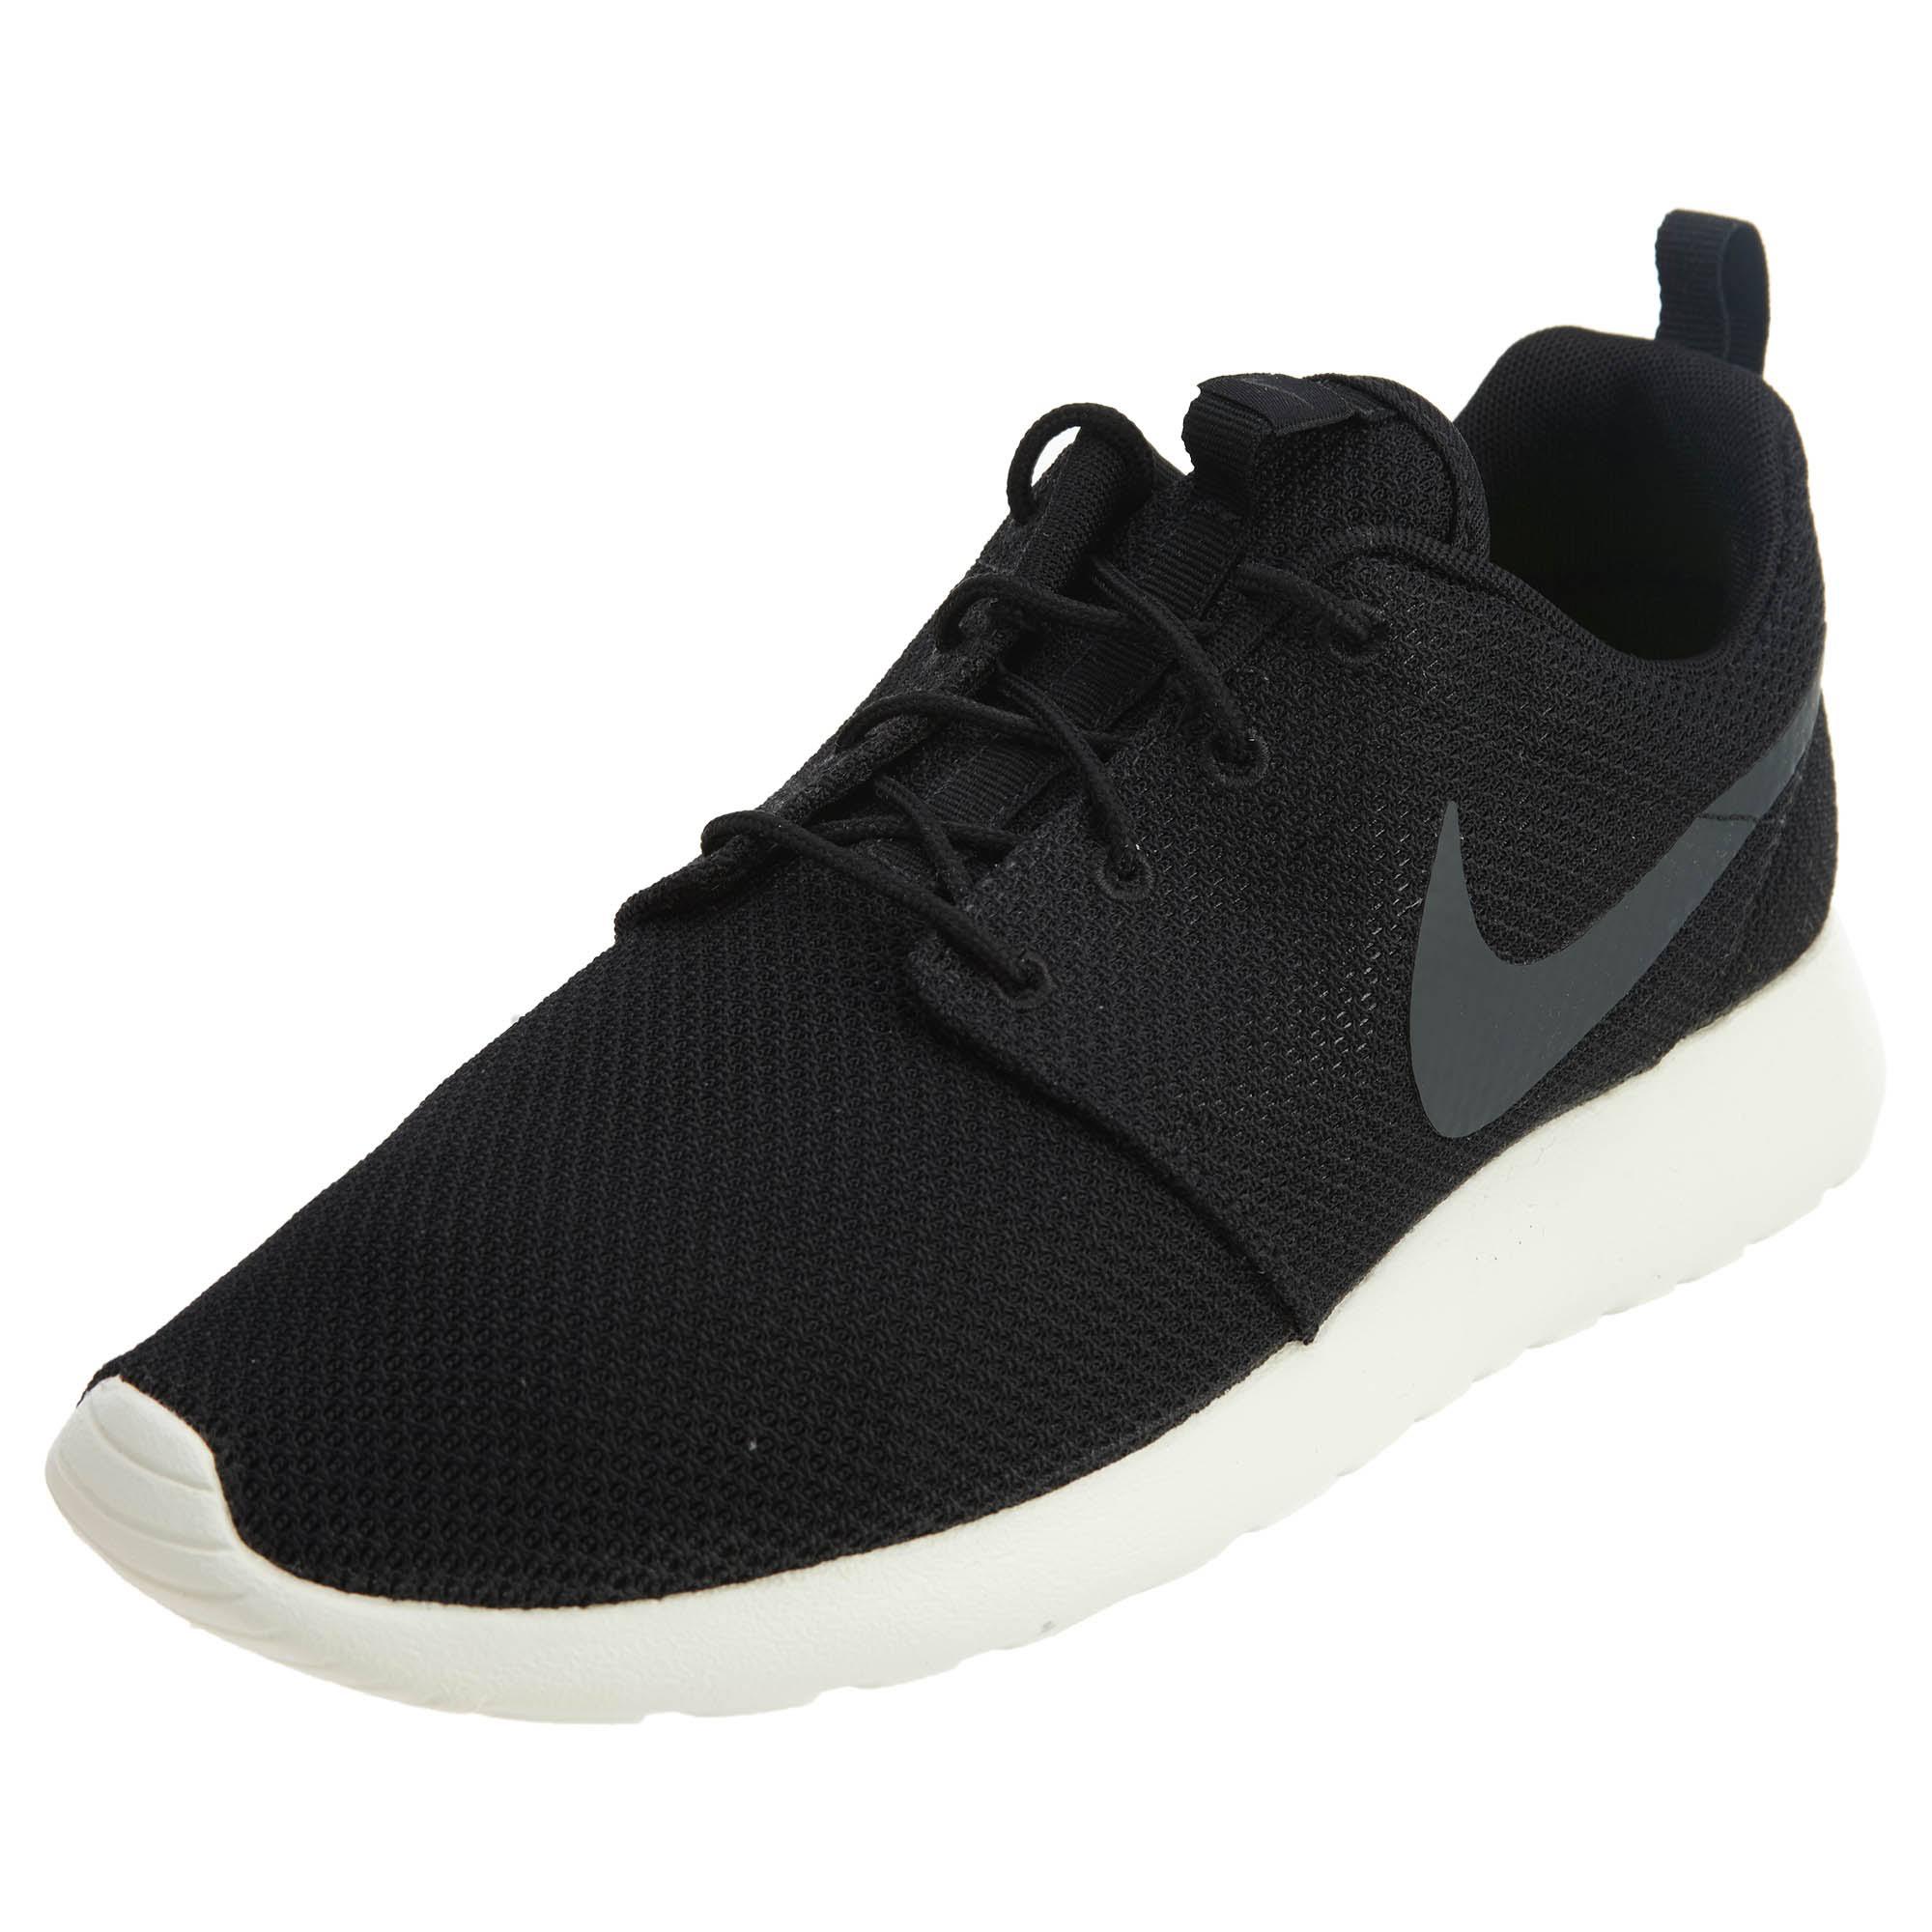 Roshe Roshe BlkAntsail Nike Nike BlkAntsail One One rxodCBeW